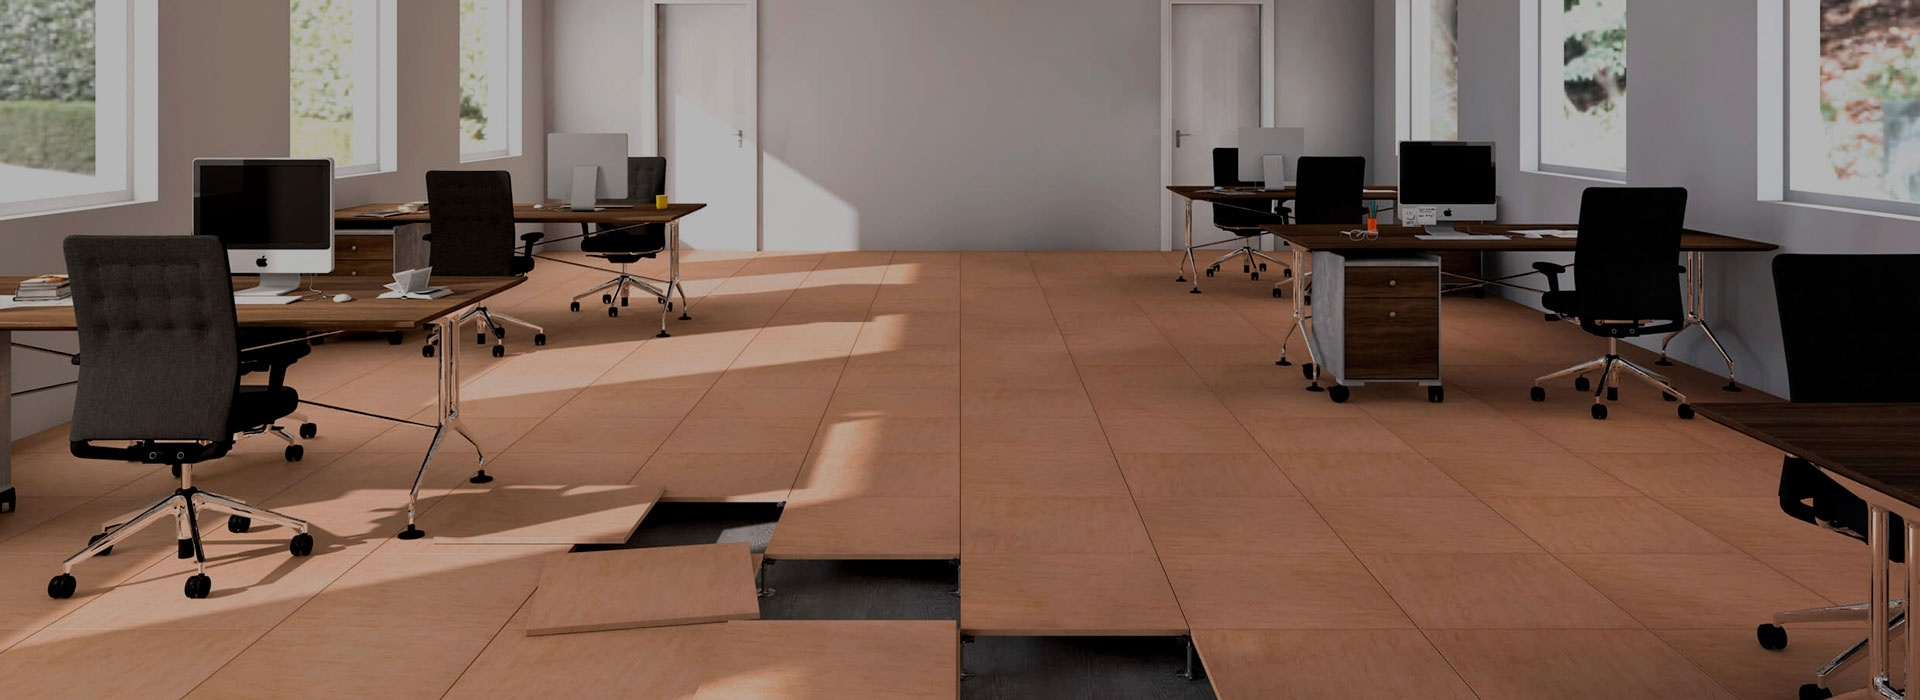 carpete-decoracoesberlin-banner1